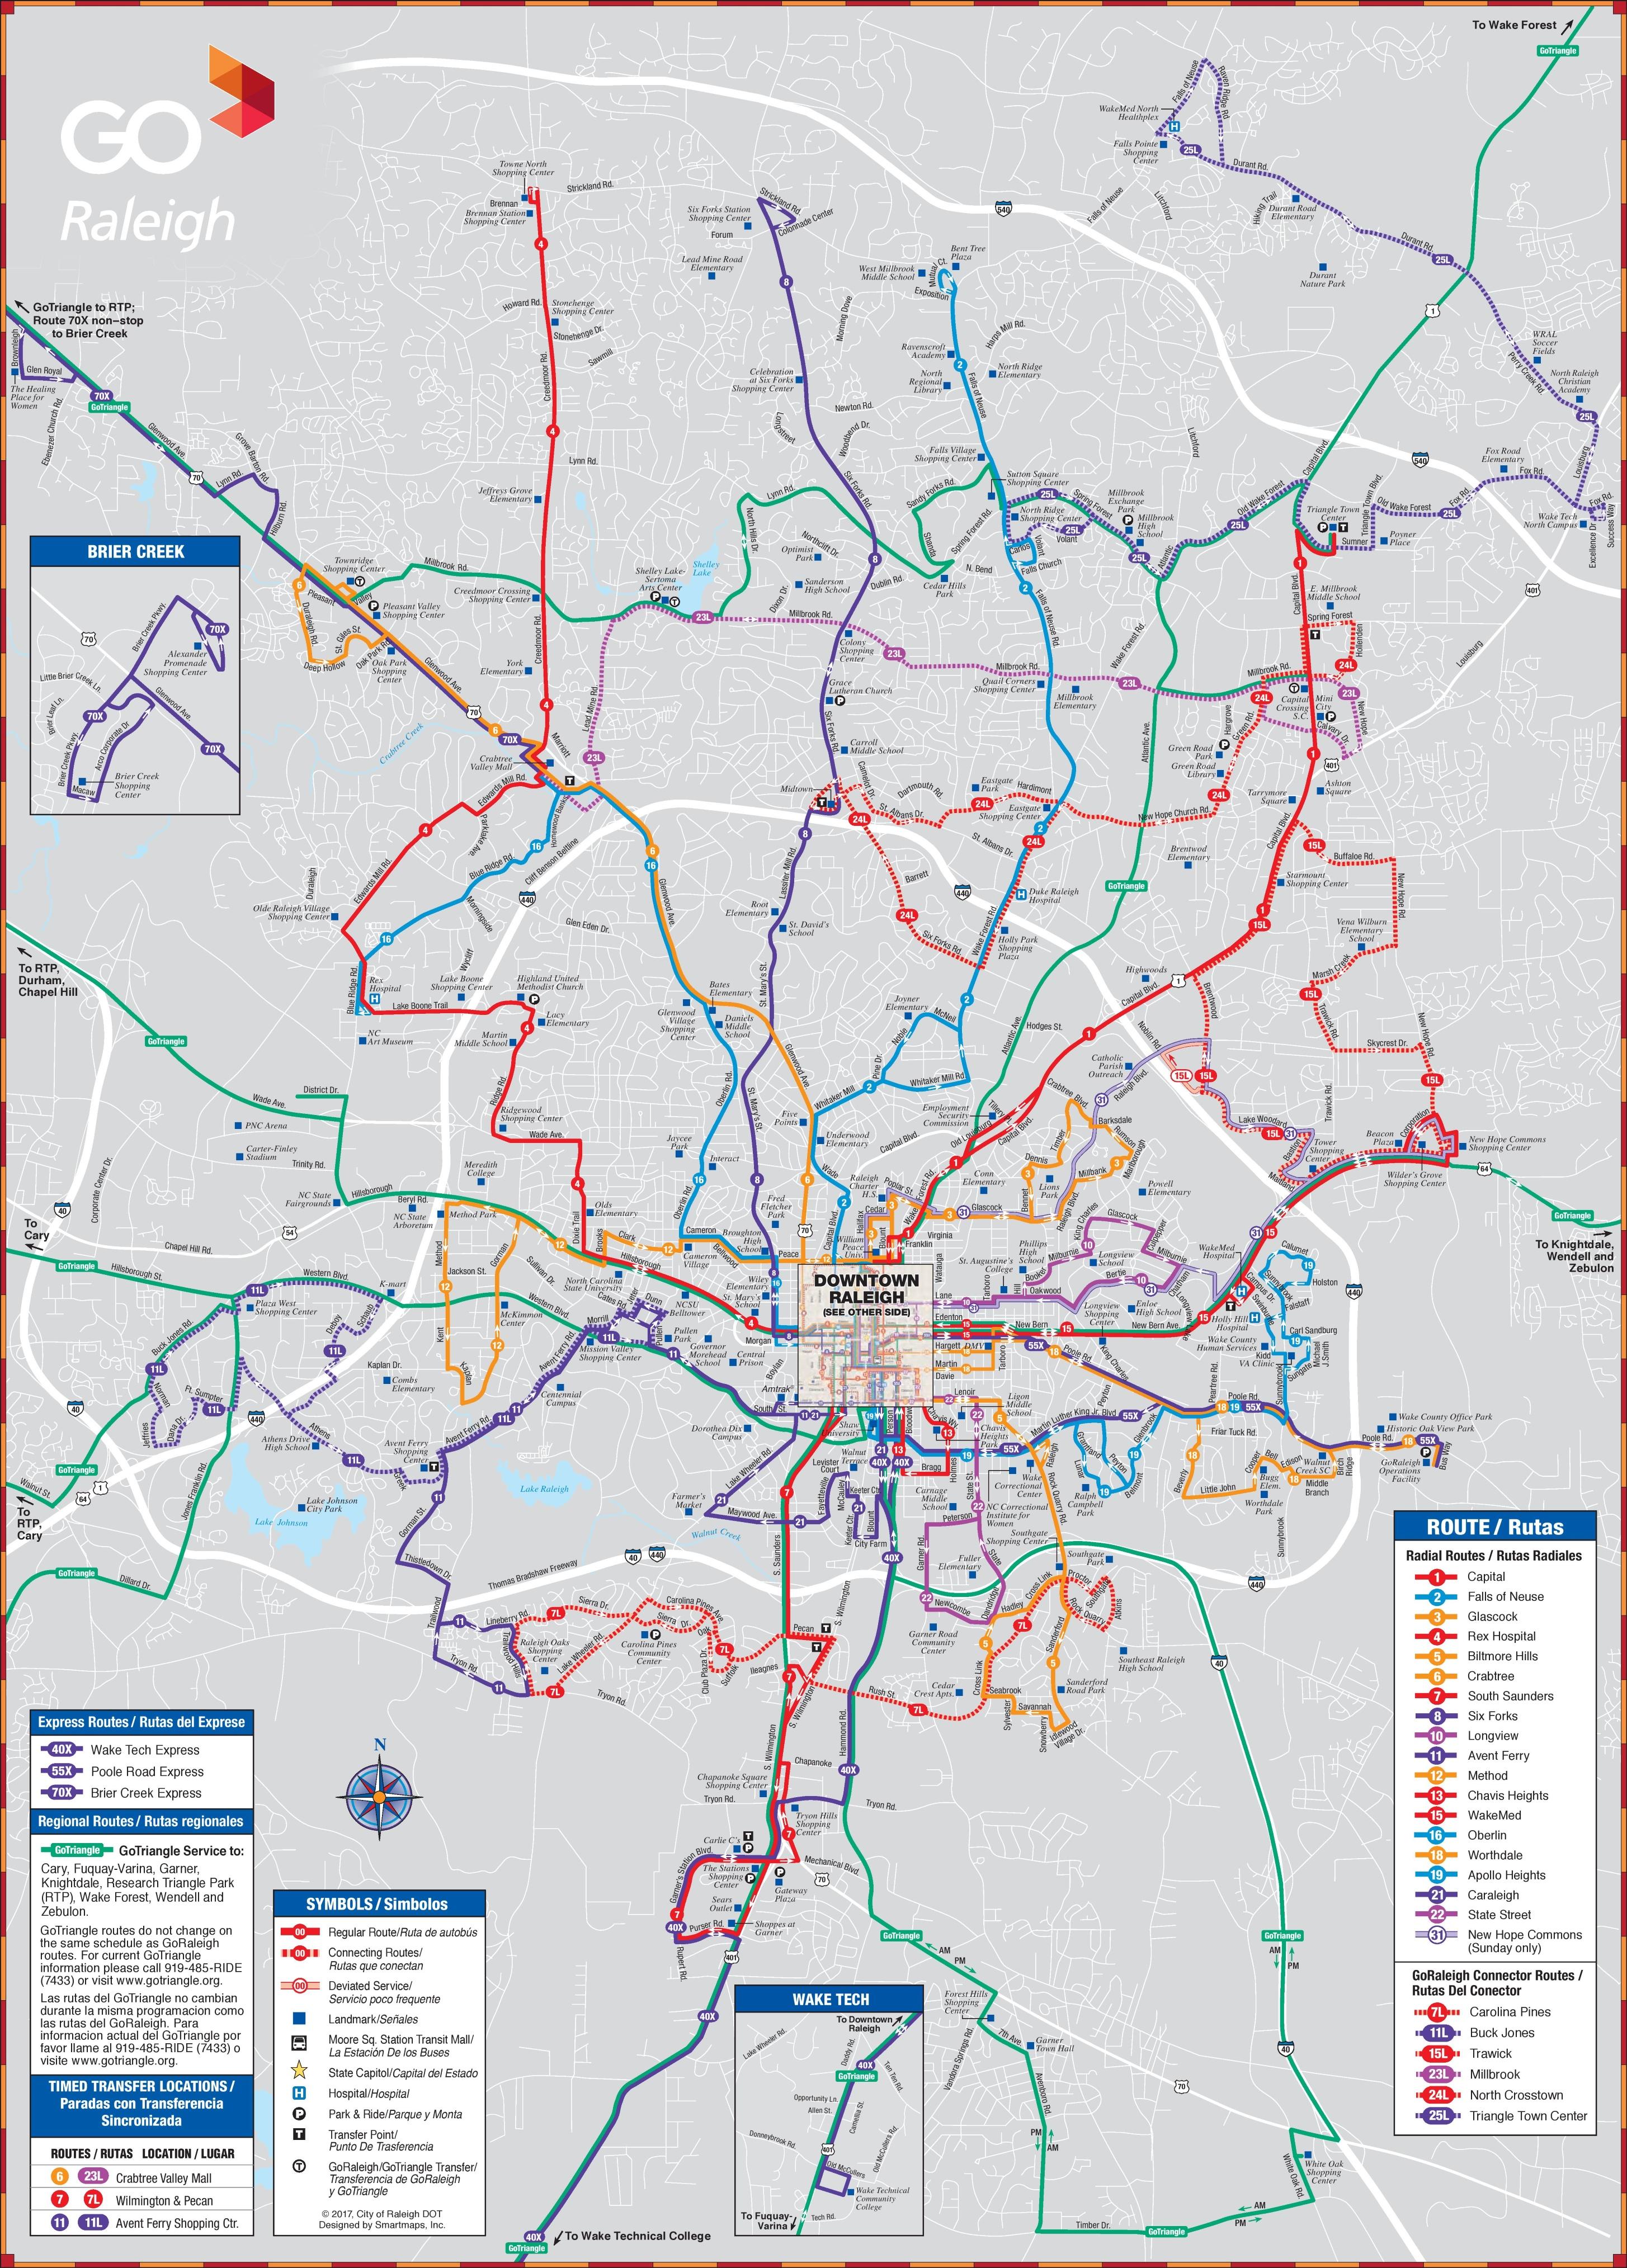 Raleigh transport map